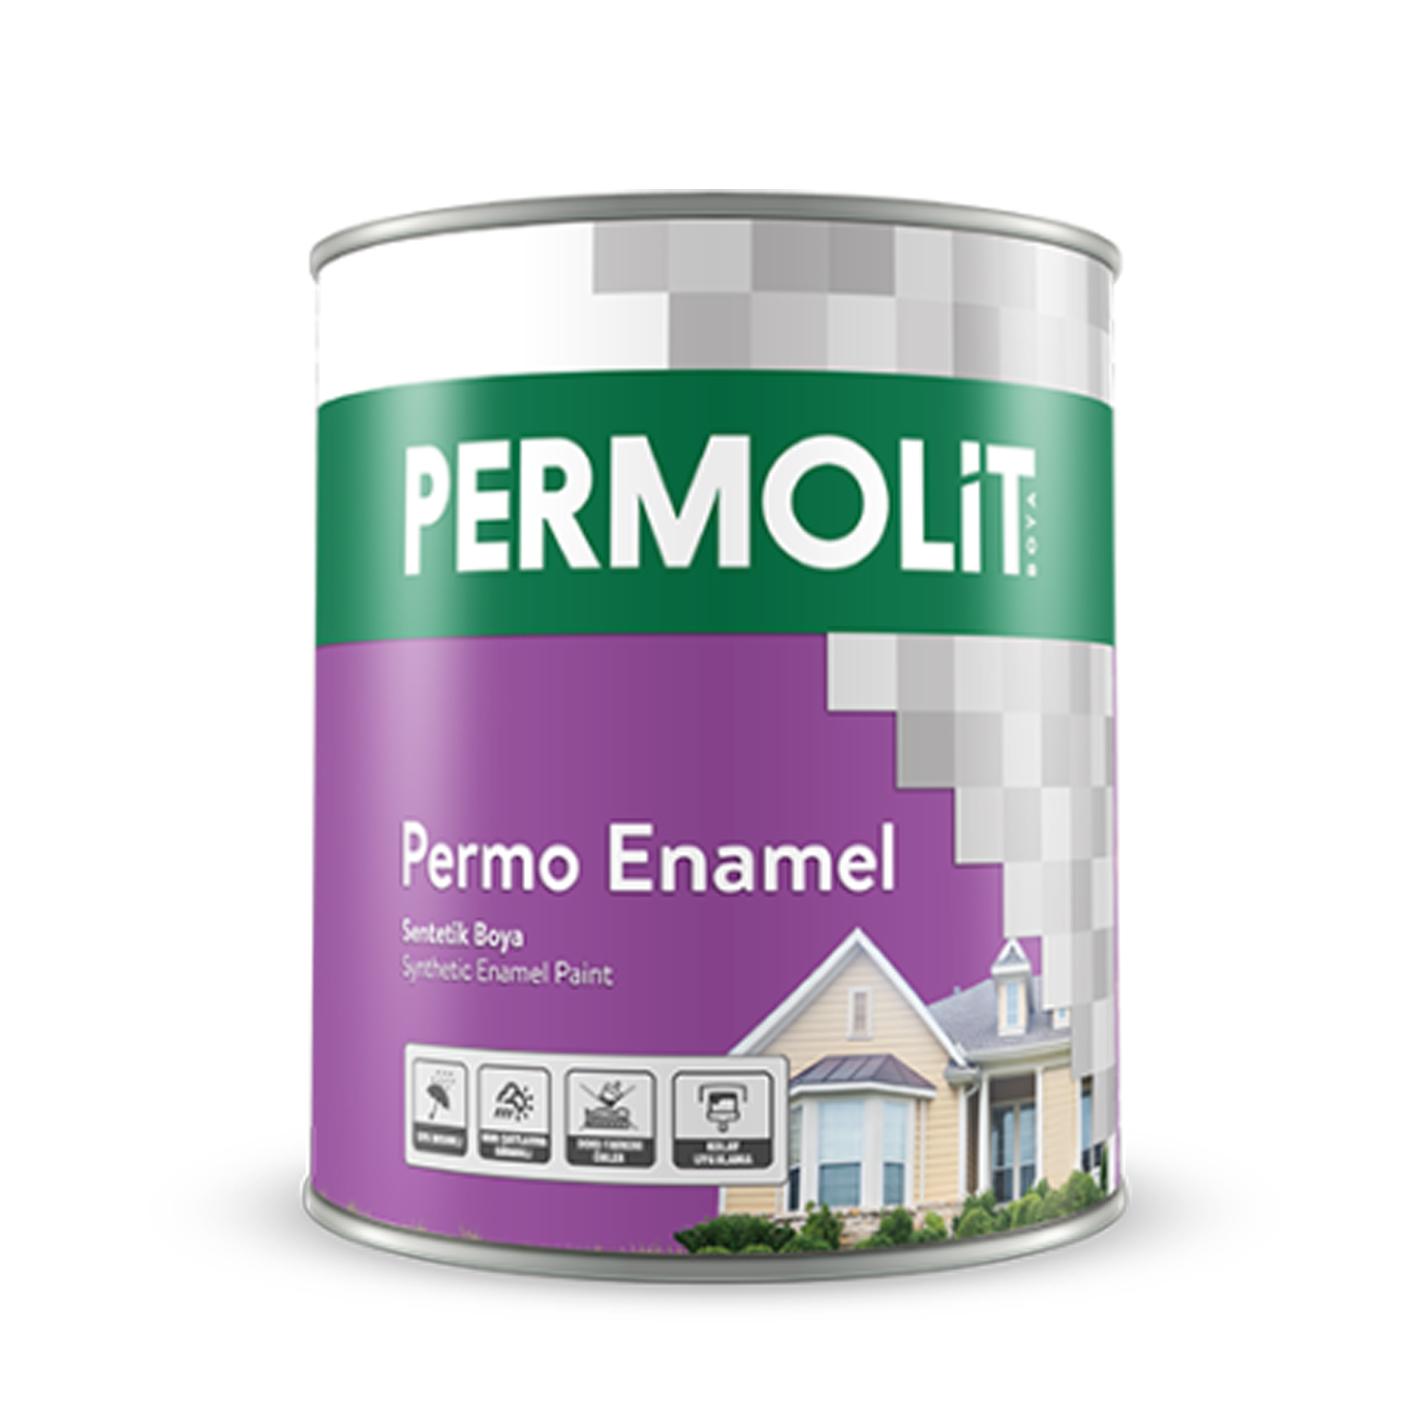 Permolit Permo Enamel Sentetik Siyah 0.75Lt